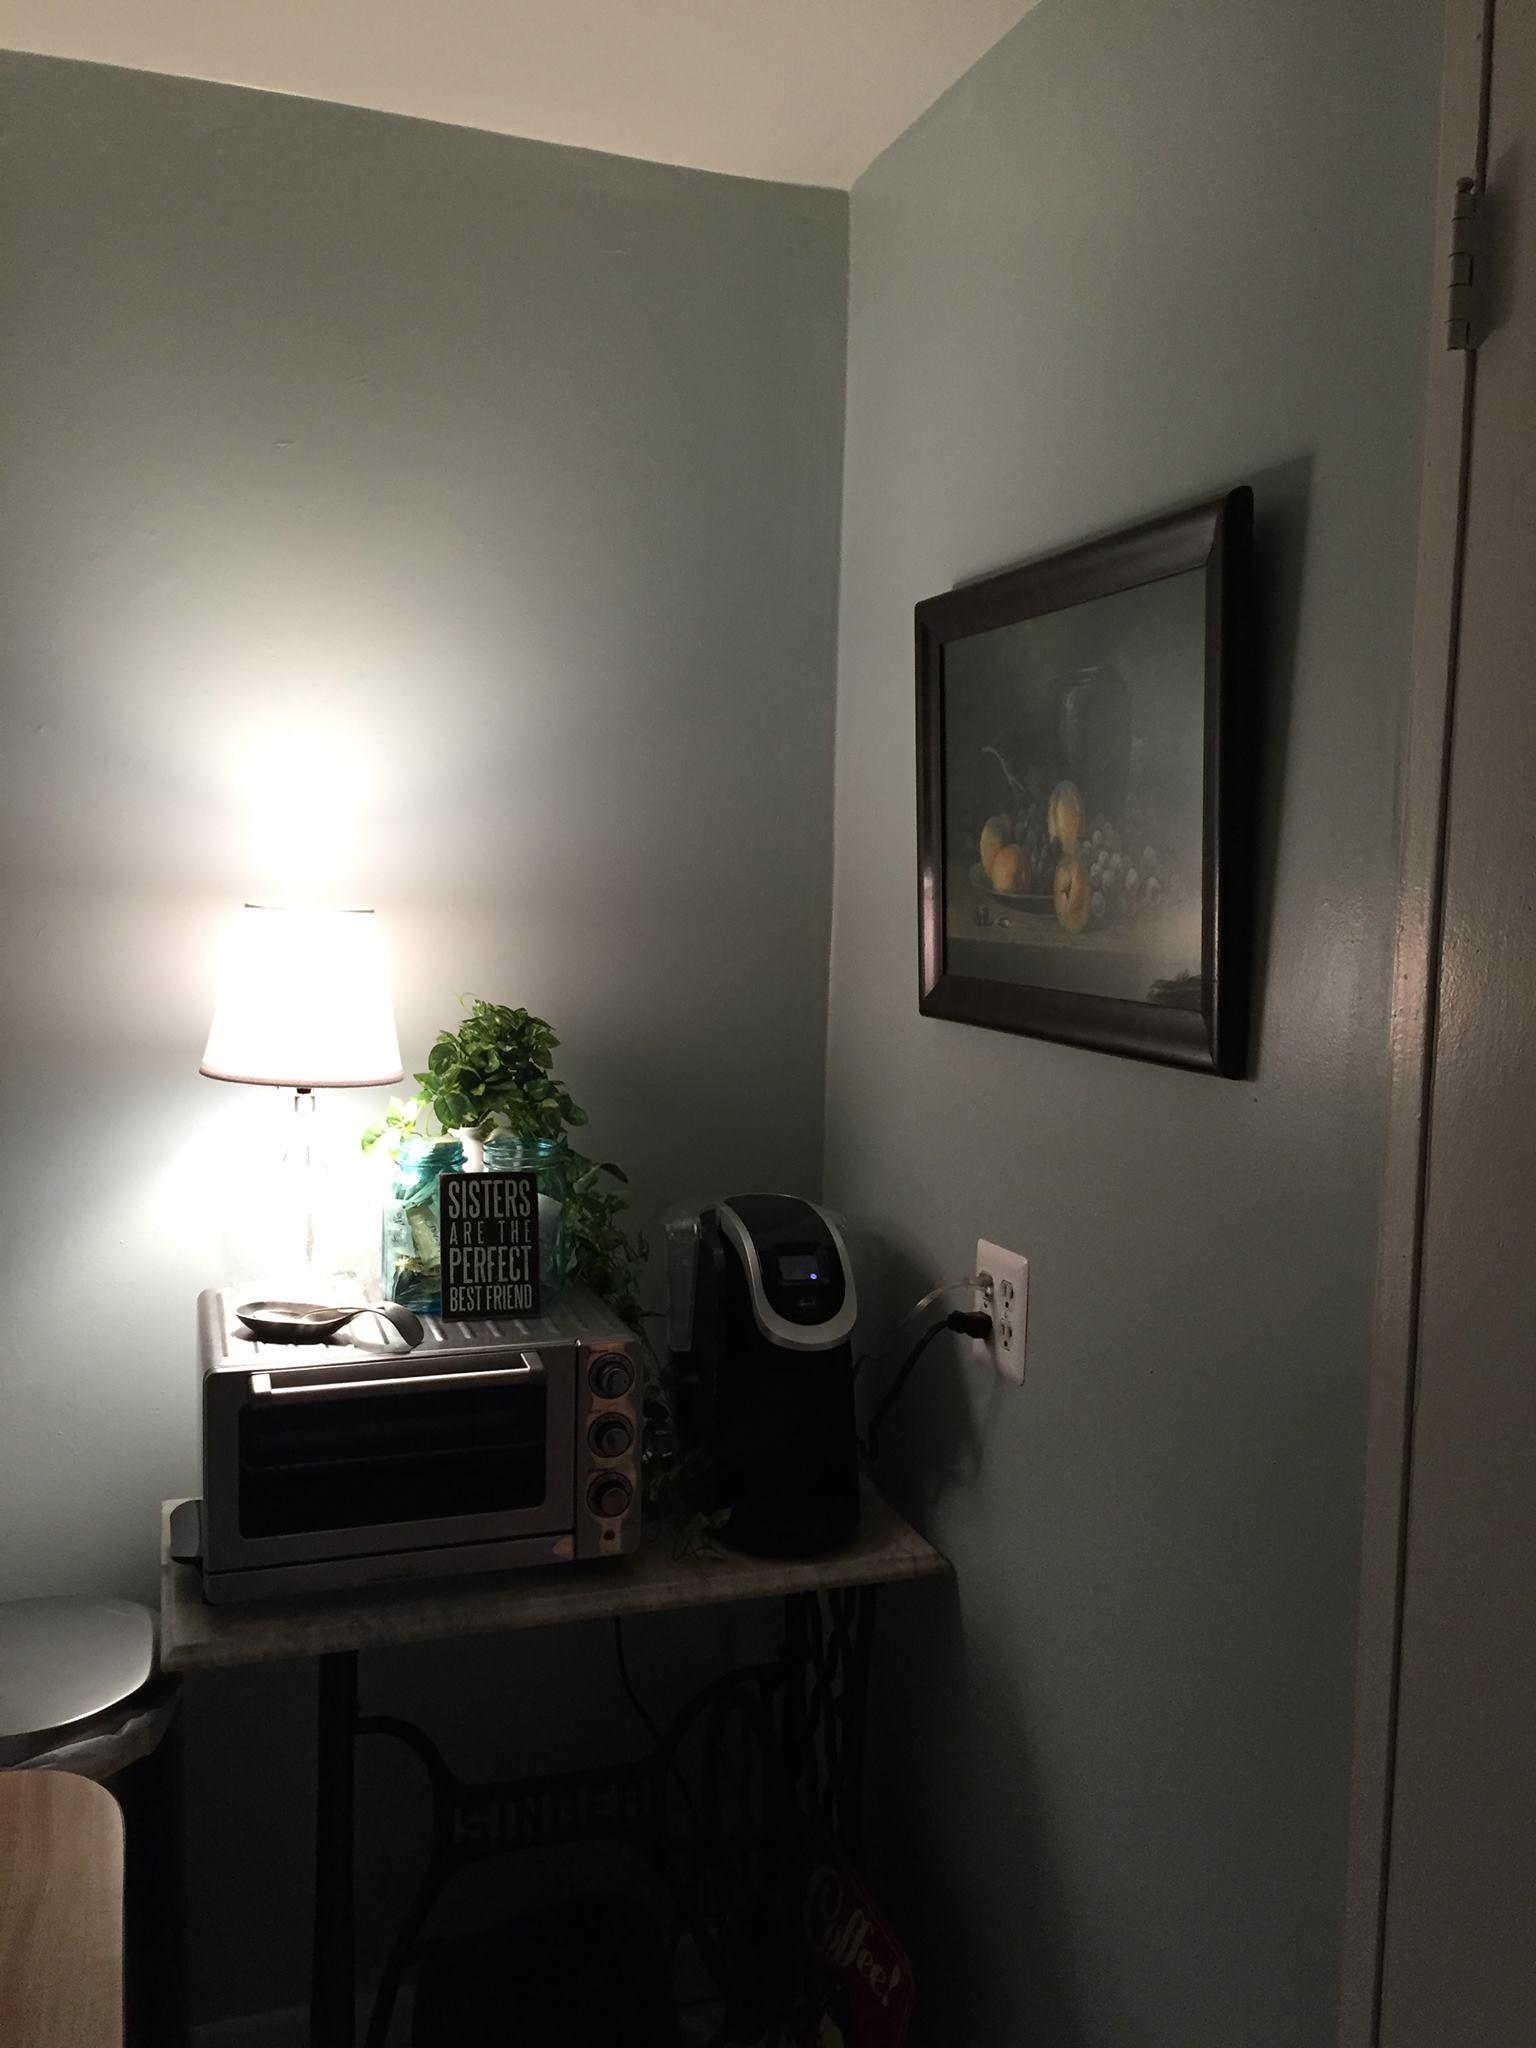 A peak at Karen's freshly painted NYC kitchen!